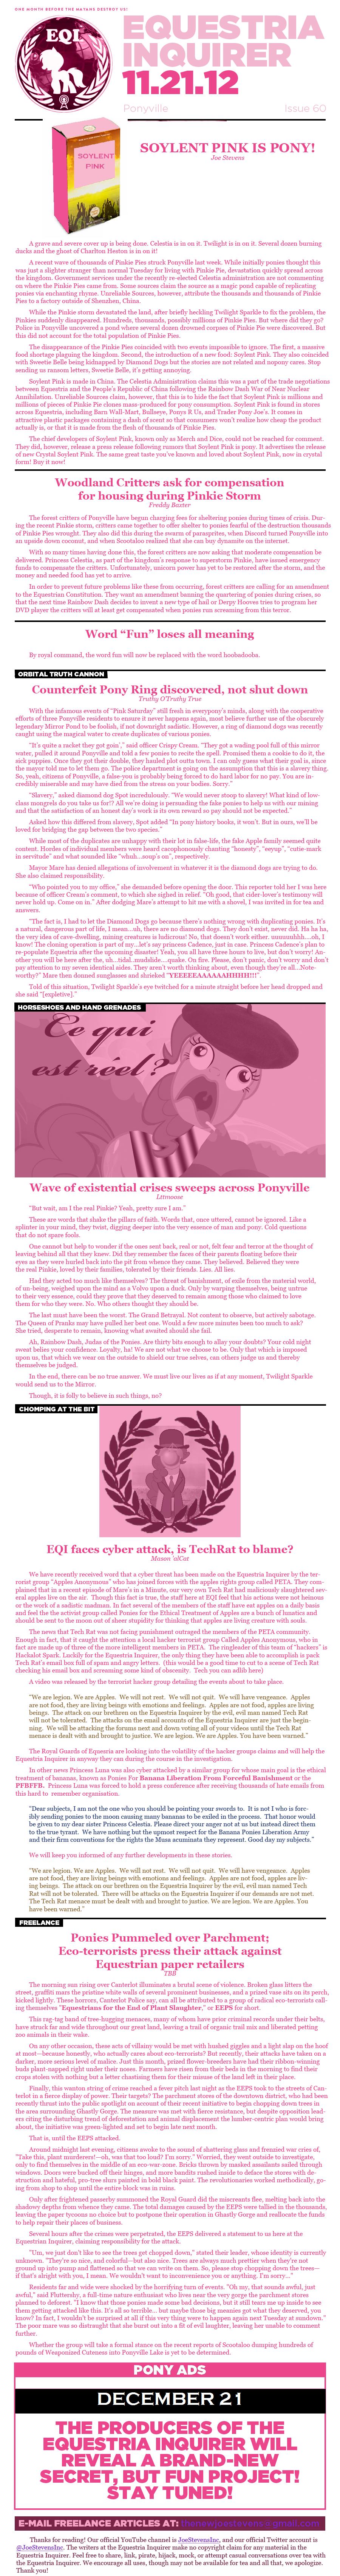 Equestria Inquirer 60 by JoeStevensInc